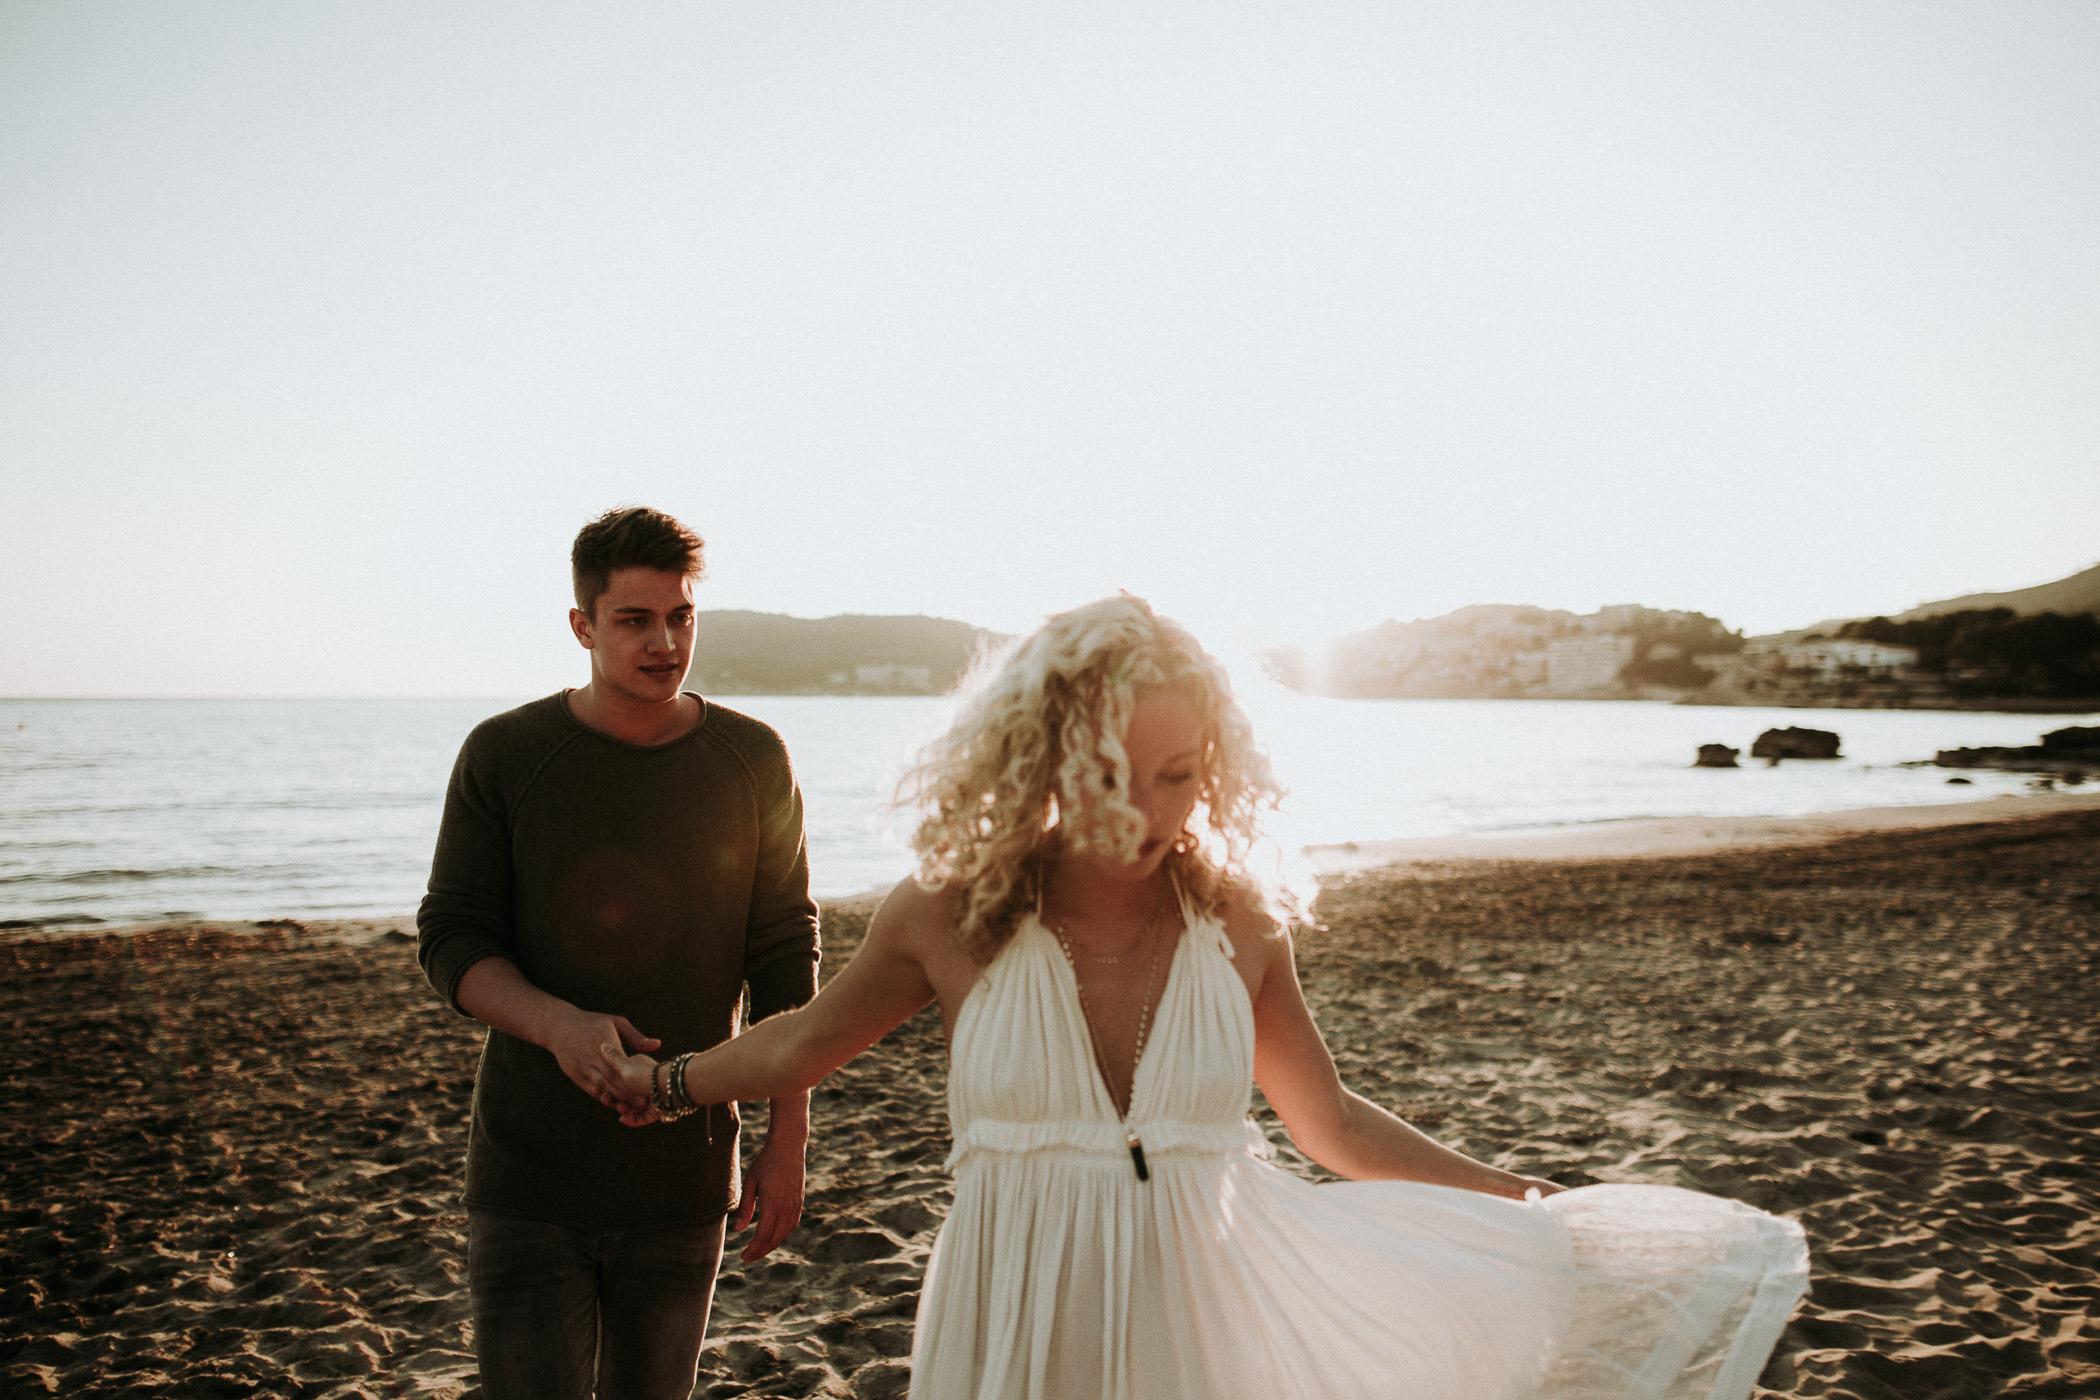 DanielaMarquardtPhotography_elopement_mallorca_spain_paguera_palma_charlyandbela_99